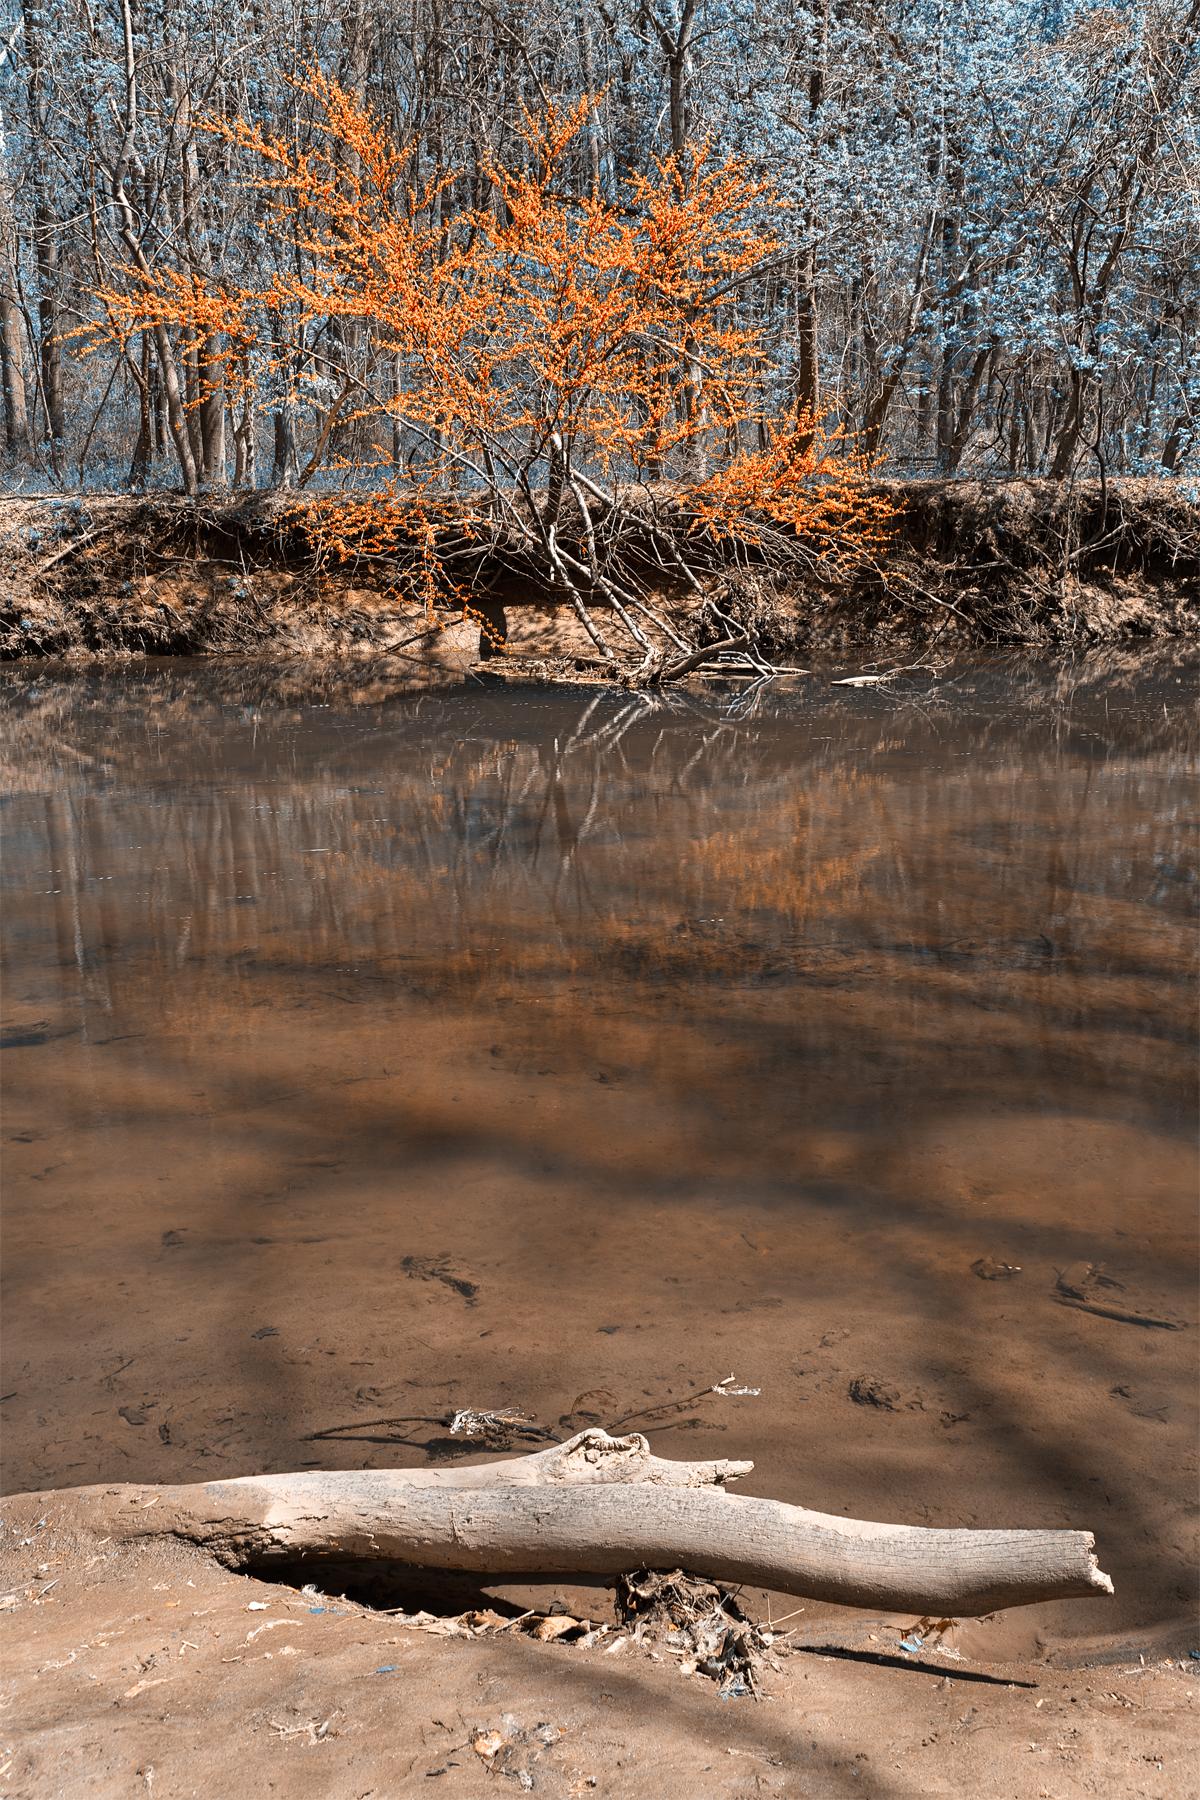 Rock creek stream & foliage - blue & ora photo